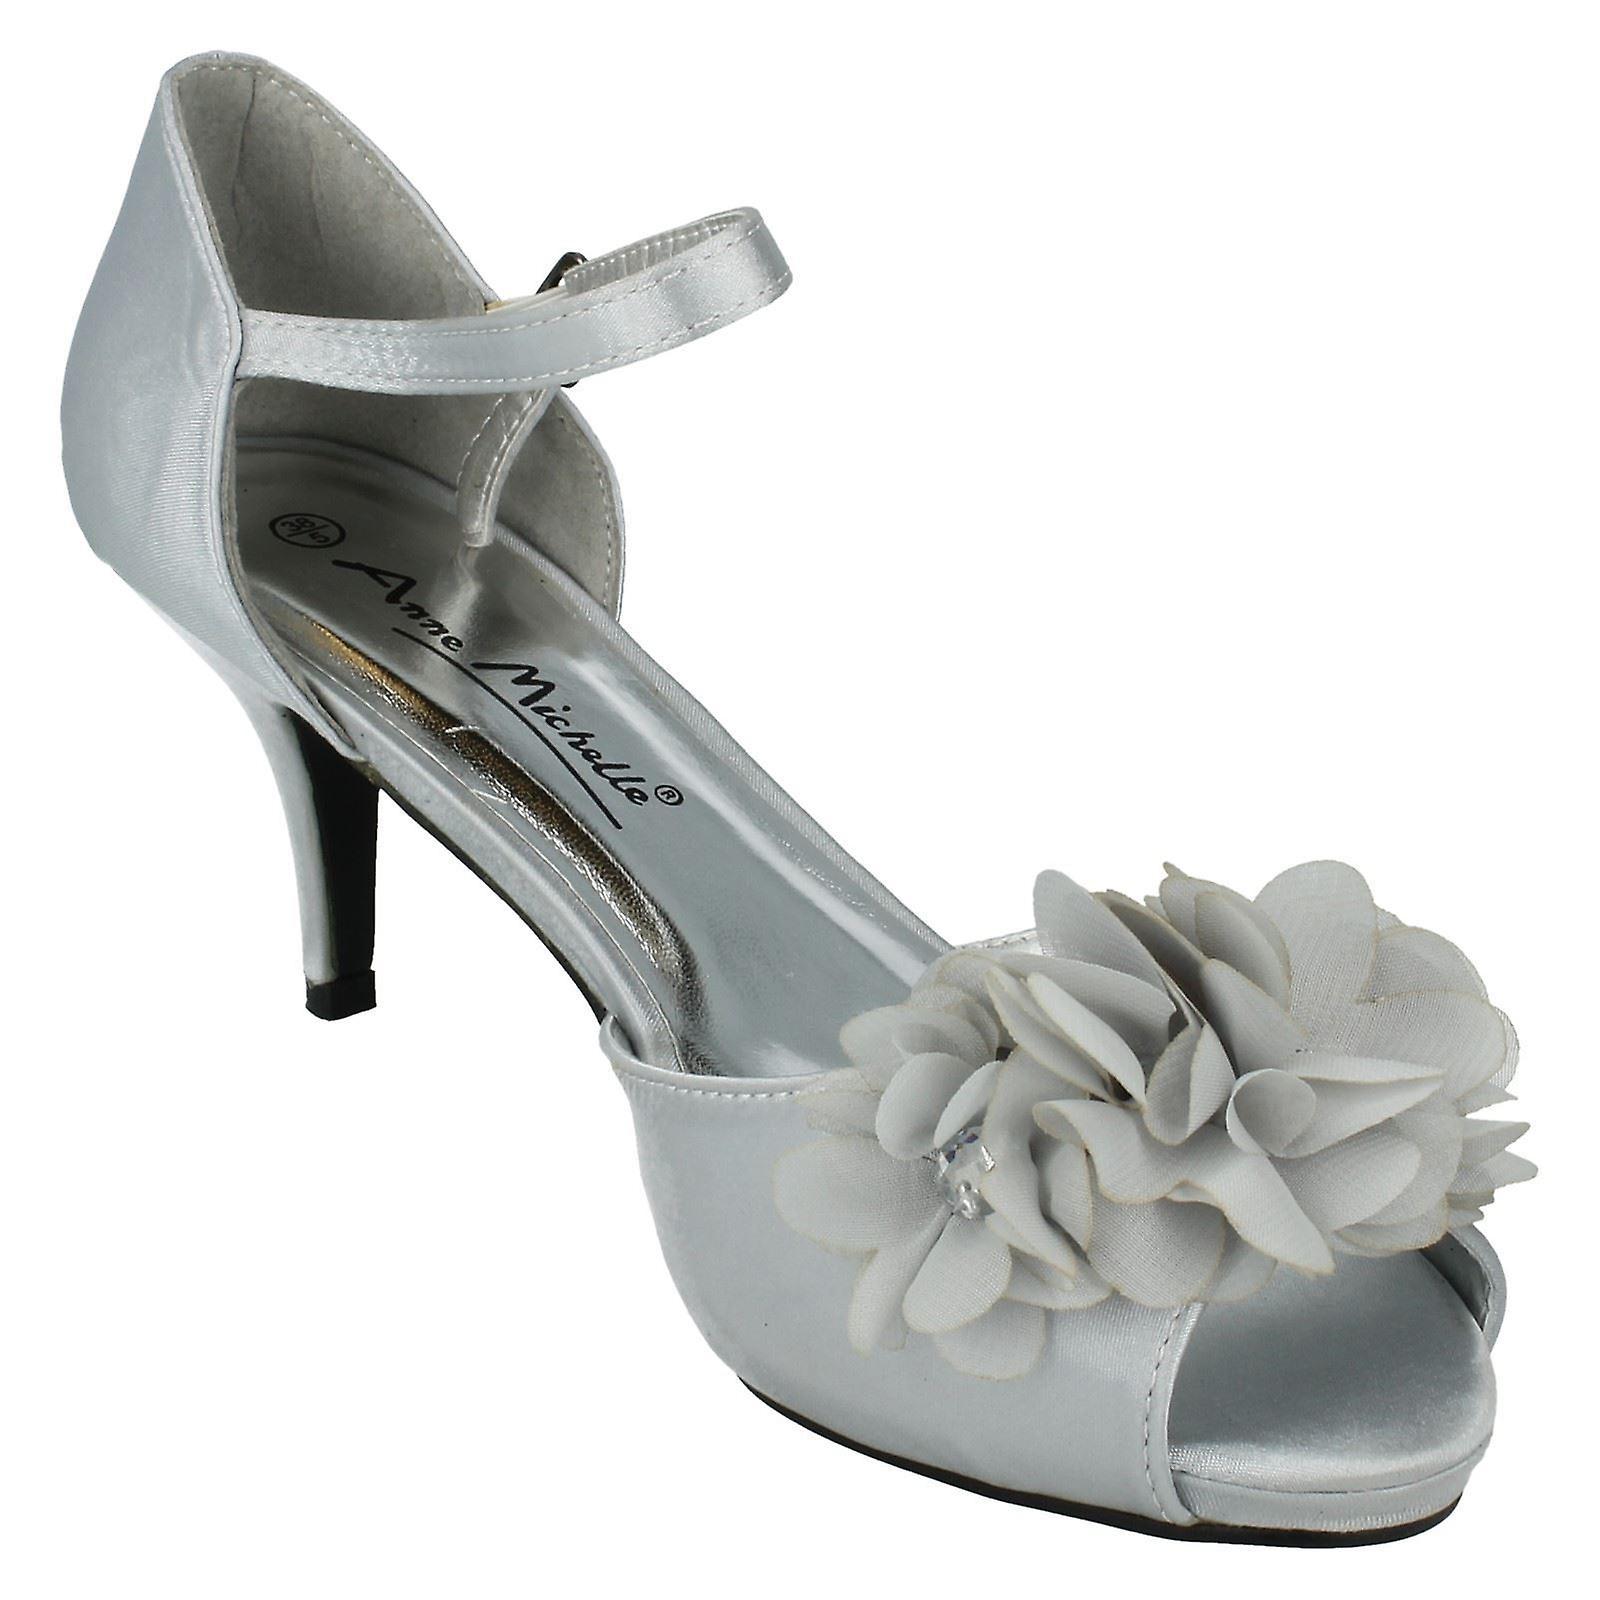 Ladies Anne Michelle Blomst Trim Heeled Sandaler